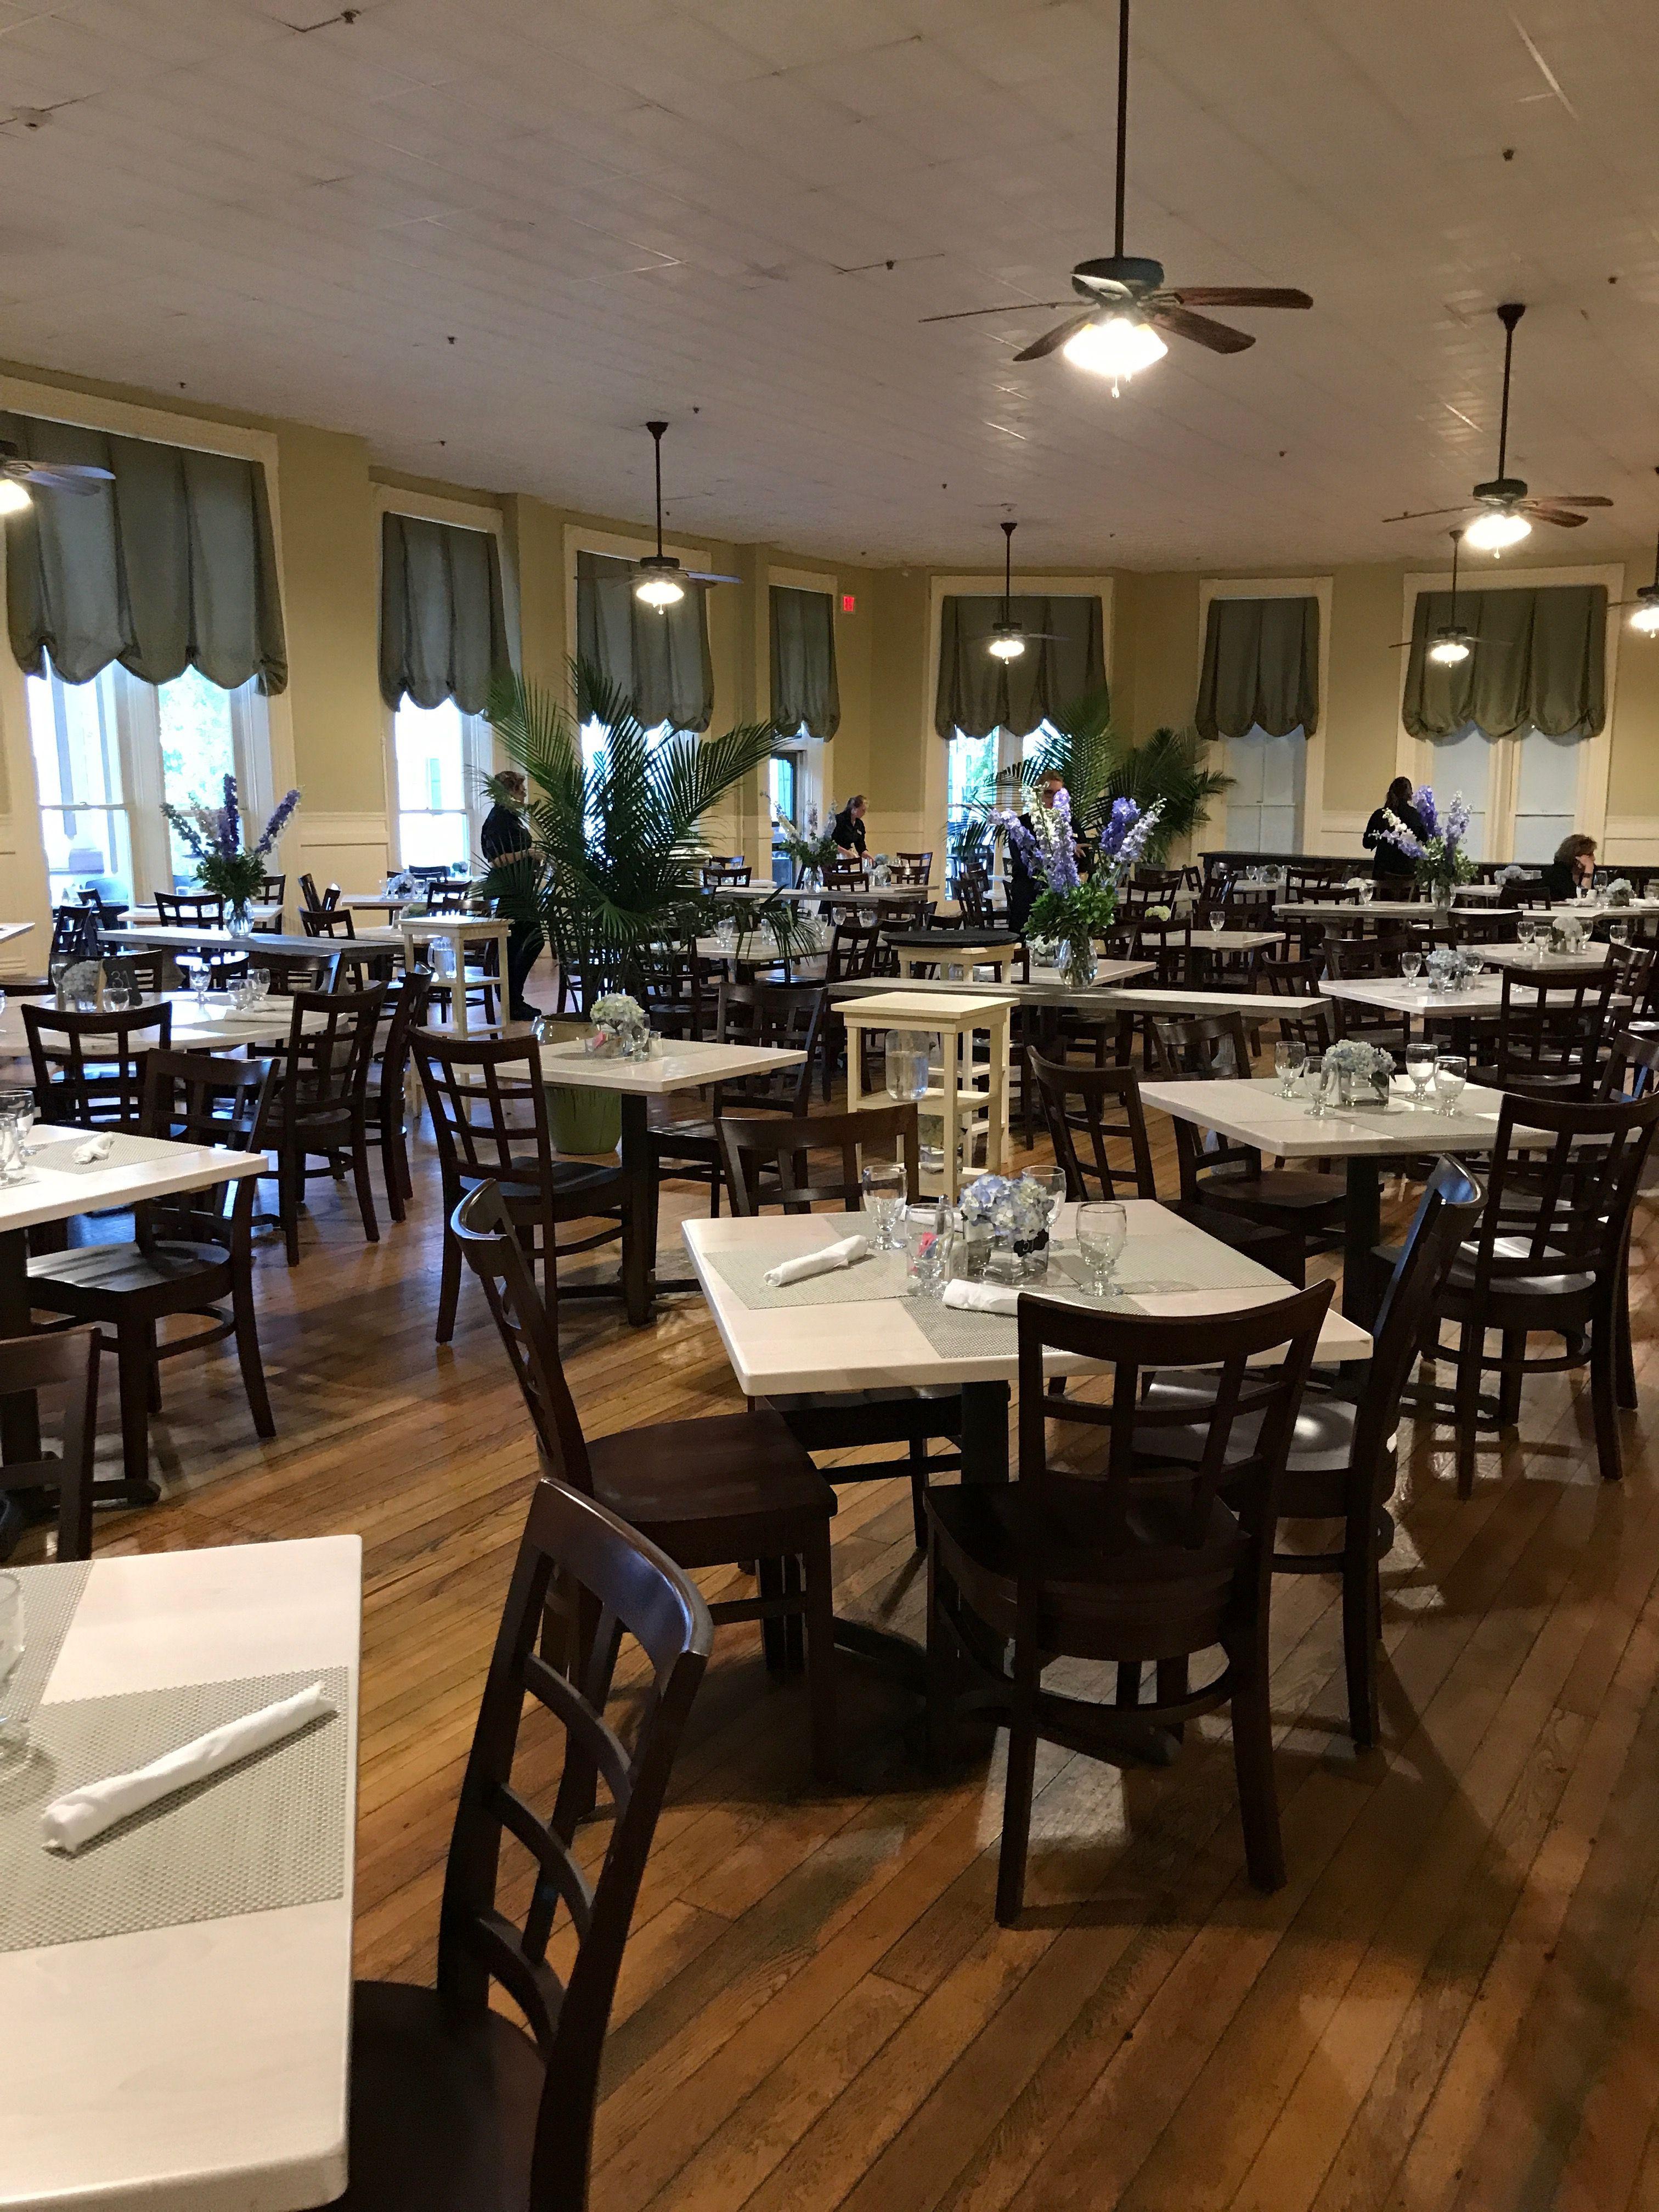 Dining Room At The Athenaeum Hotel Chautauqua Insution